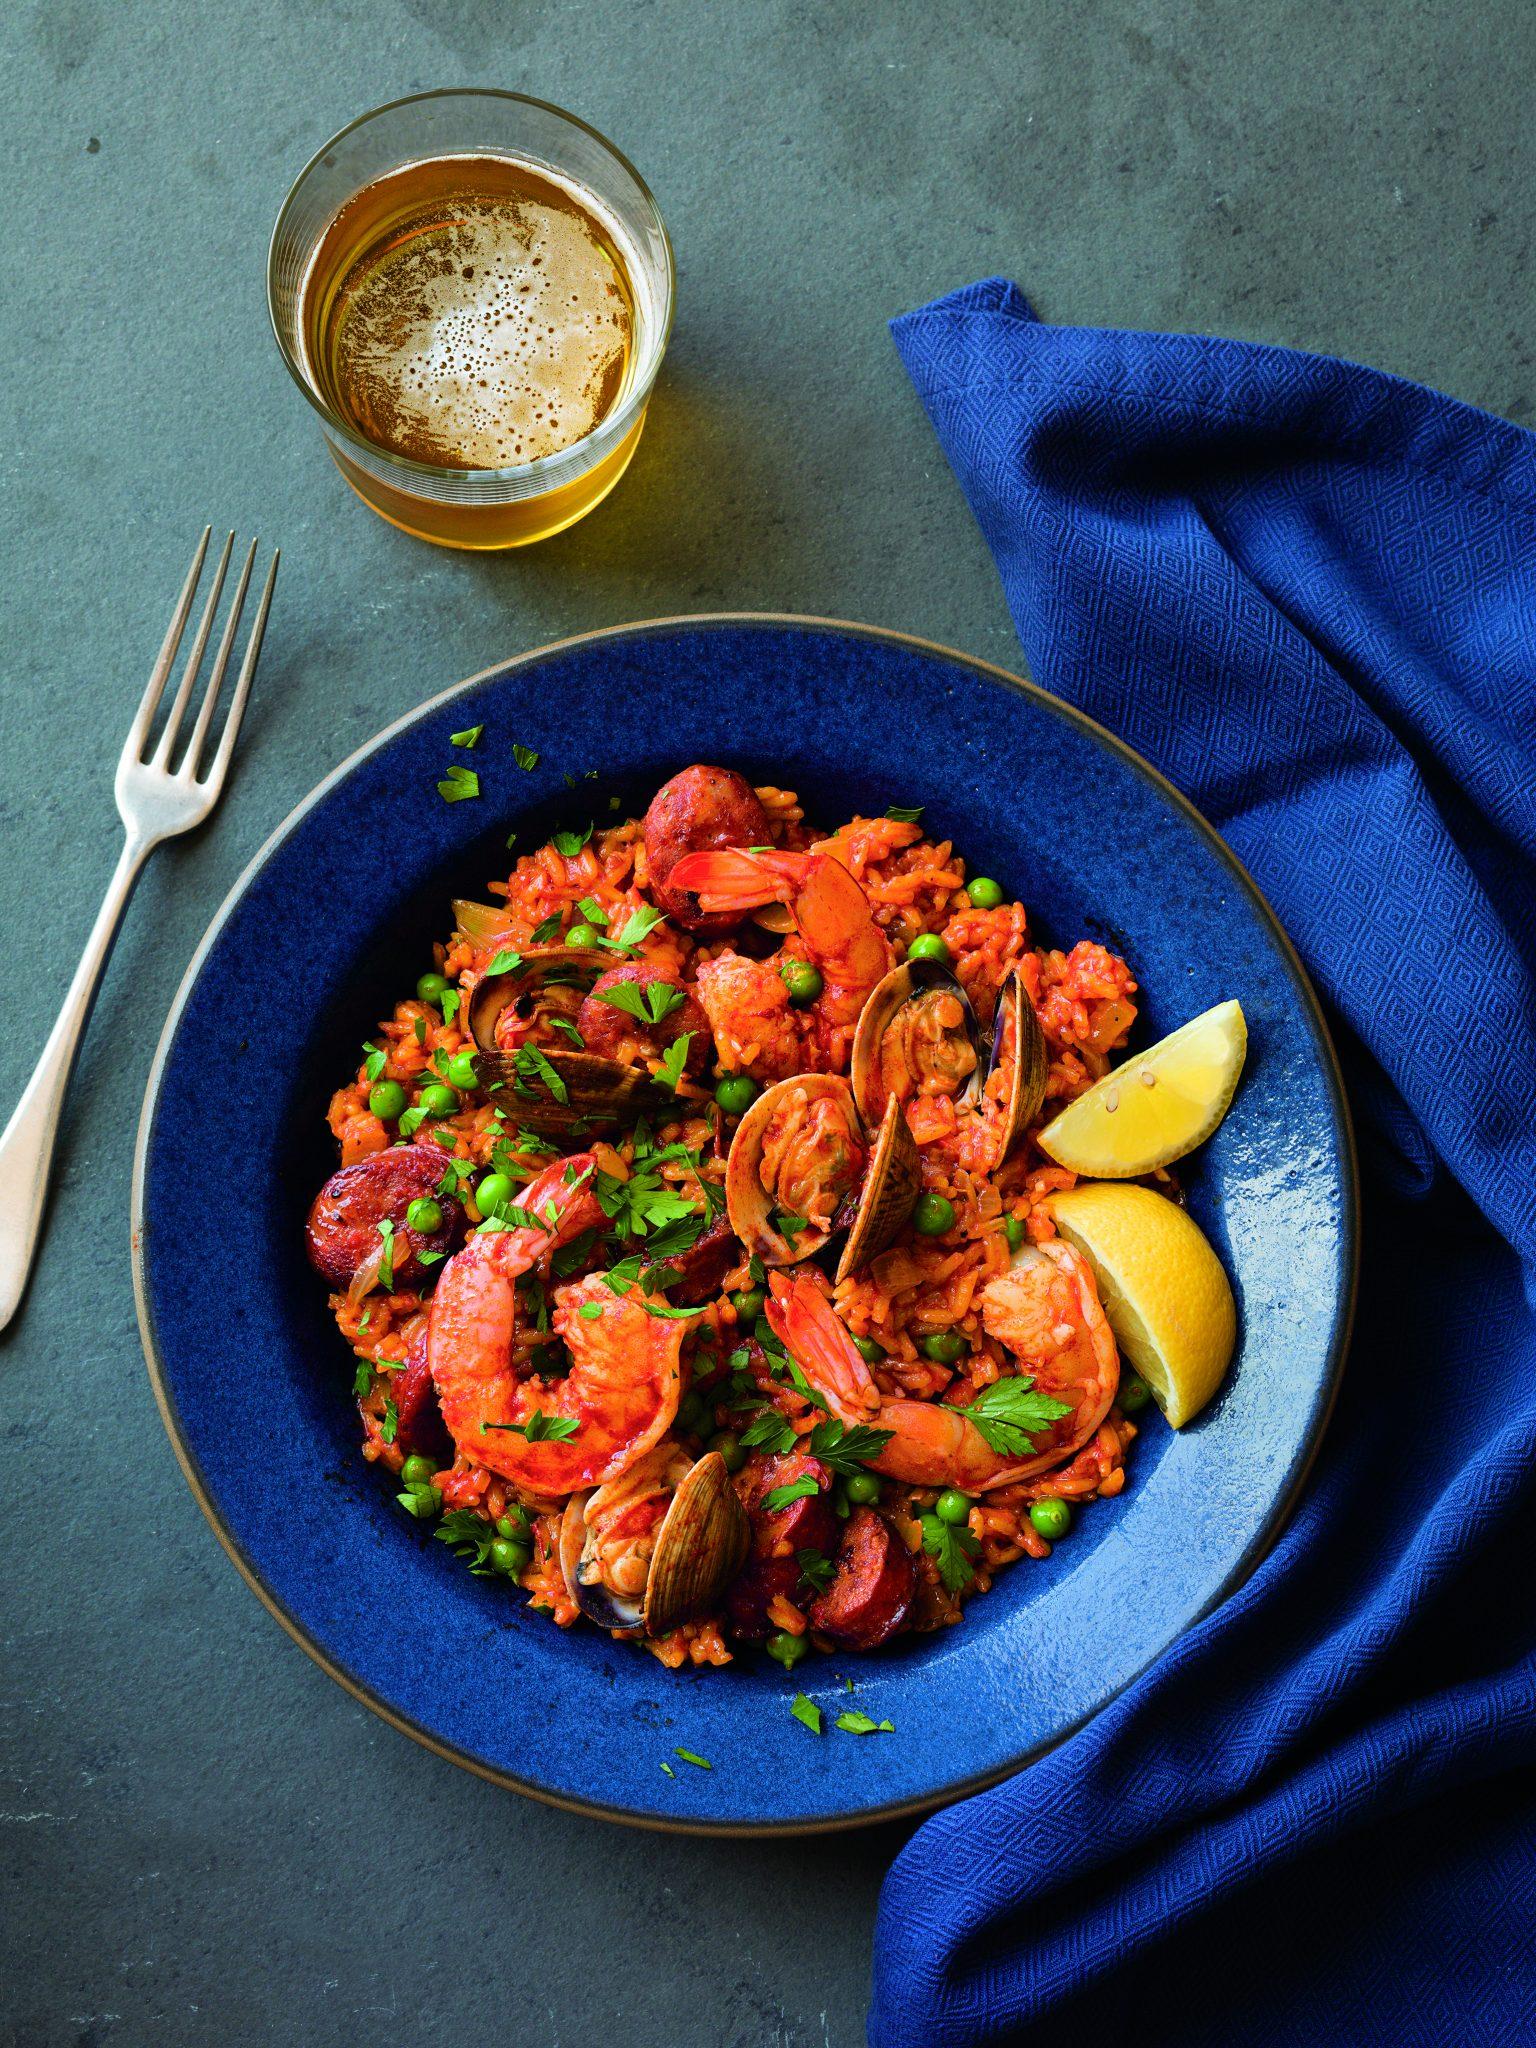 Chorizo seafood paella recipes for Instant pot fish recipes